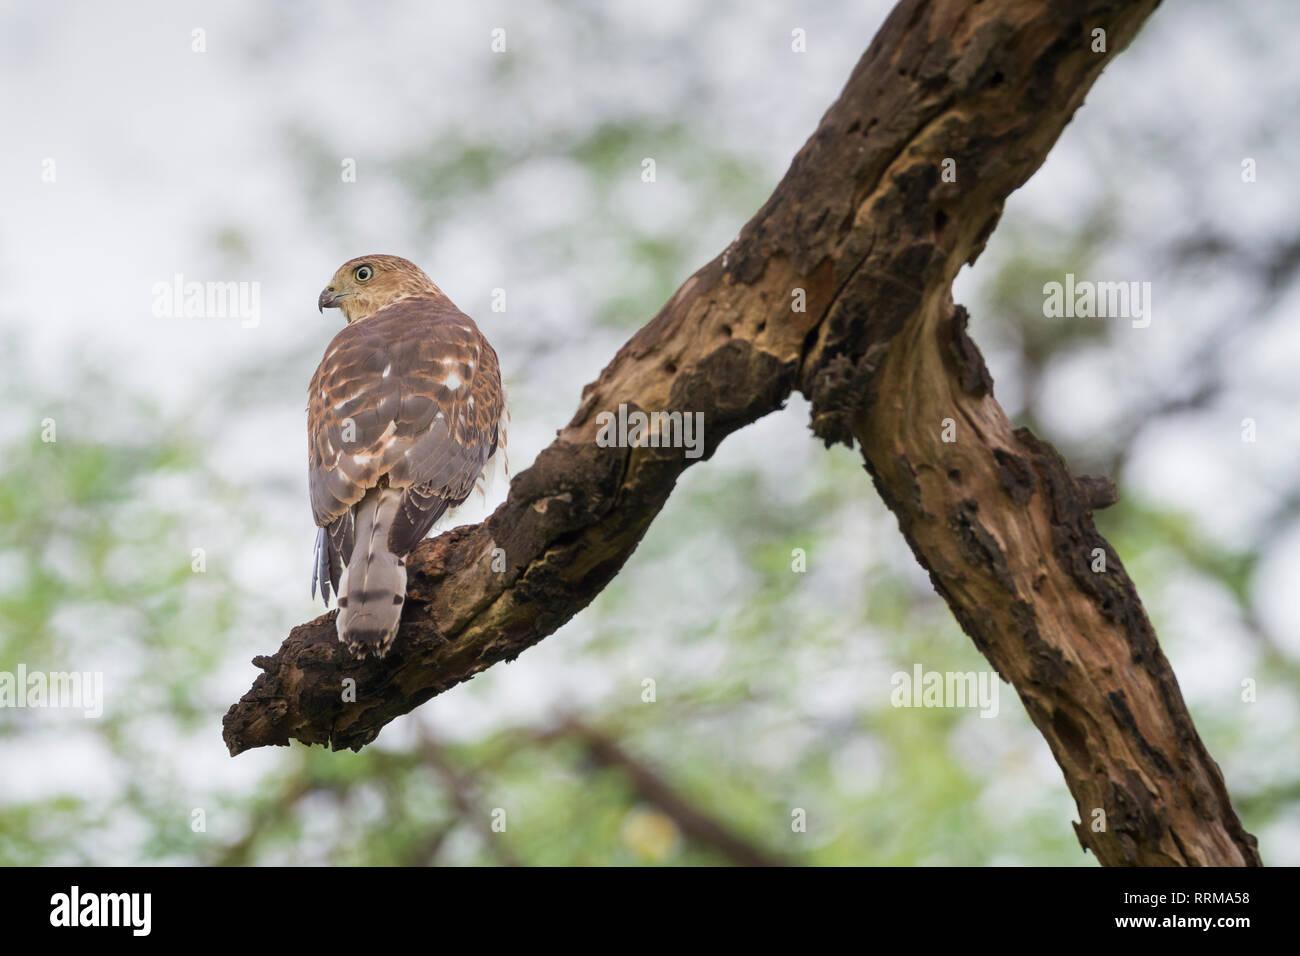 Shikra (Accipiter badius) perched on branch. Keoladeo National Park. Bharatpur. Rajasthan. India. - Stock Image